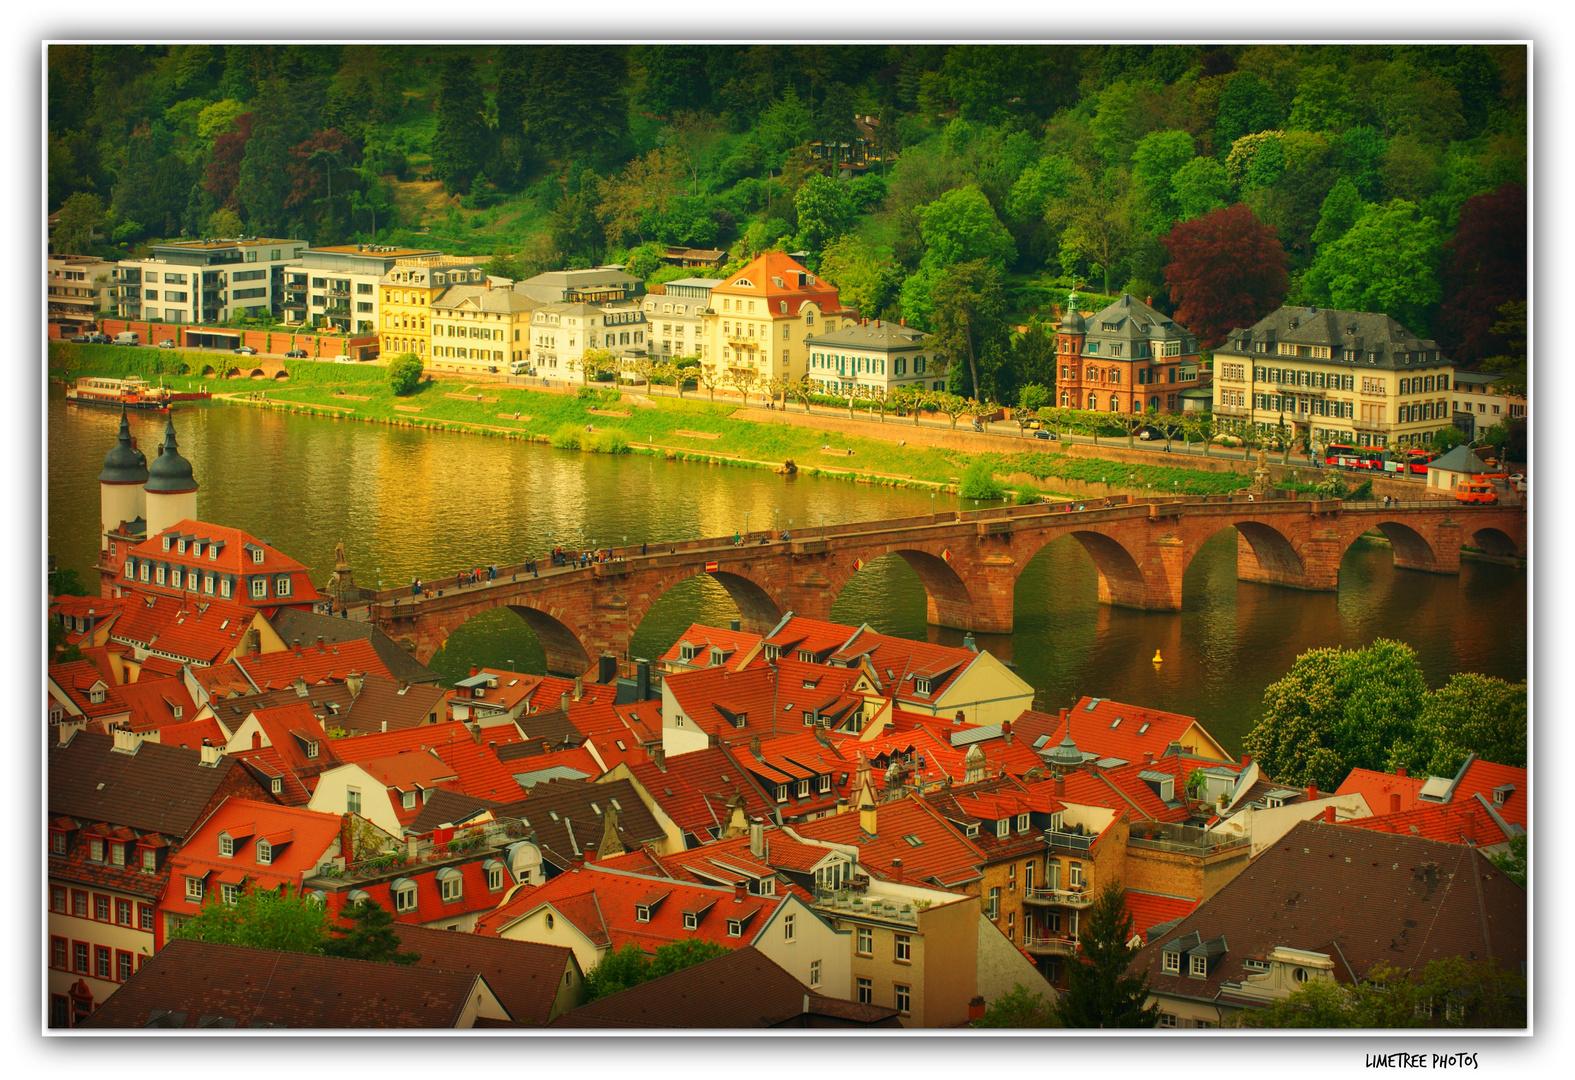 The Old Bridge of Heidelberg